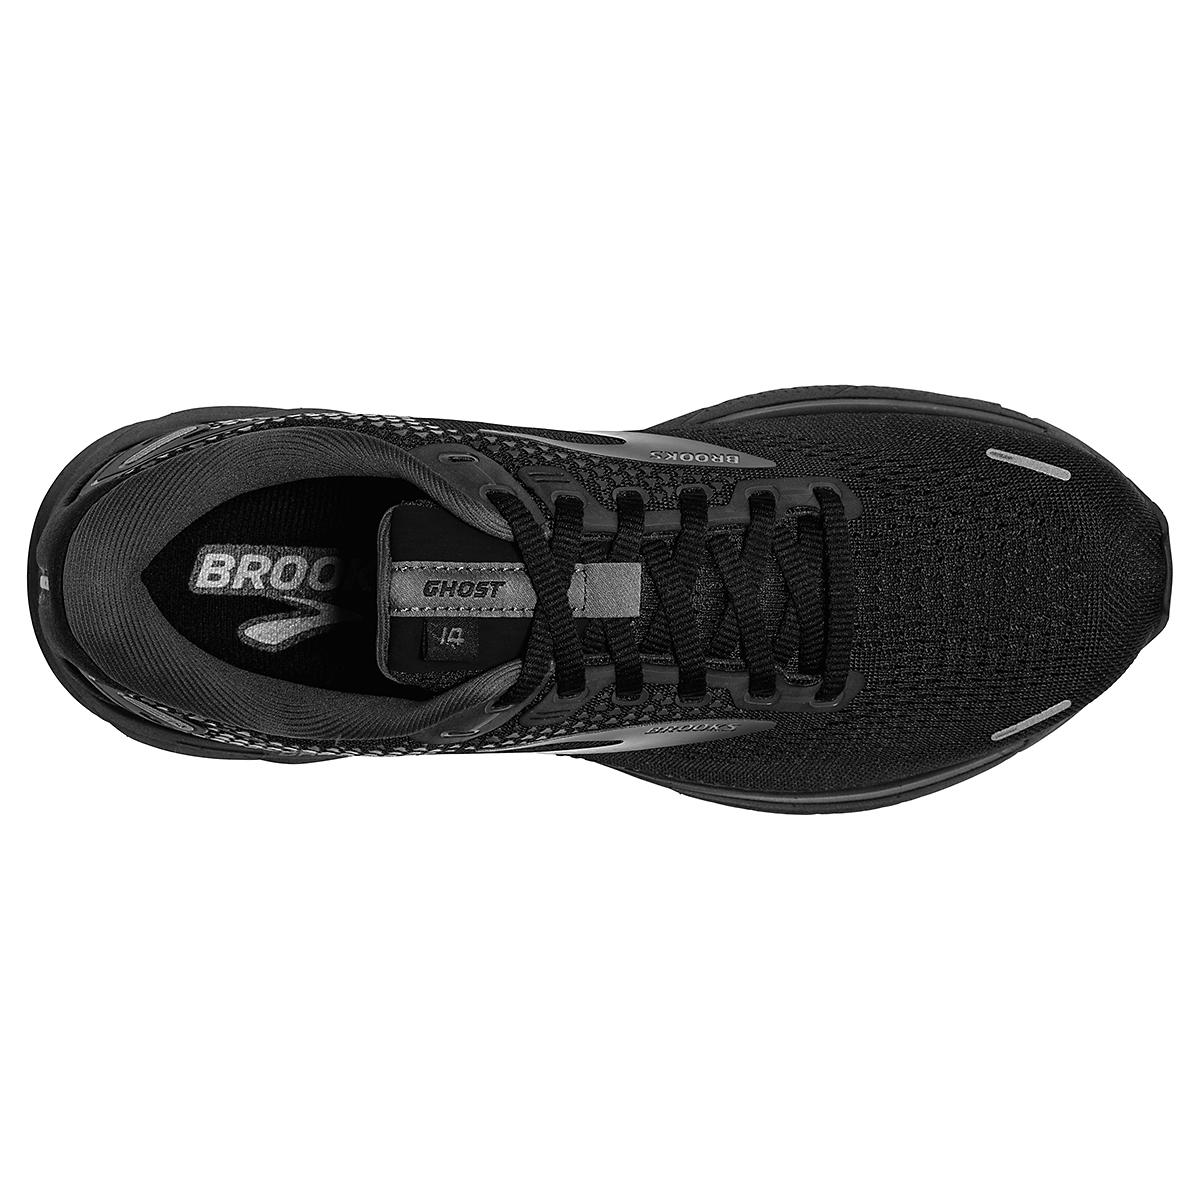 Women's Brooks Ghost 14 Running Shoe - Color: Black/Black/Ebony - Size: 5 - Width: Regular, Black/Black/Ebony, large, image 3